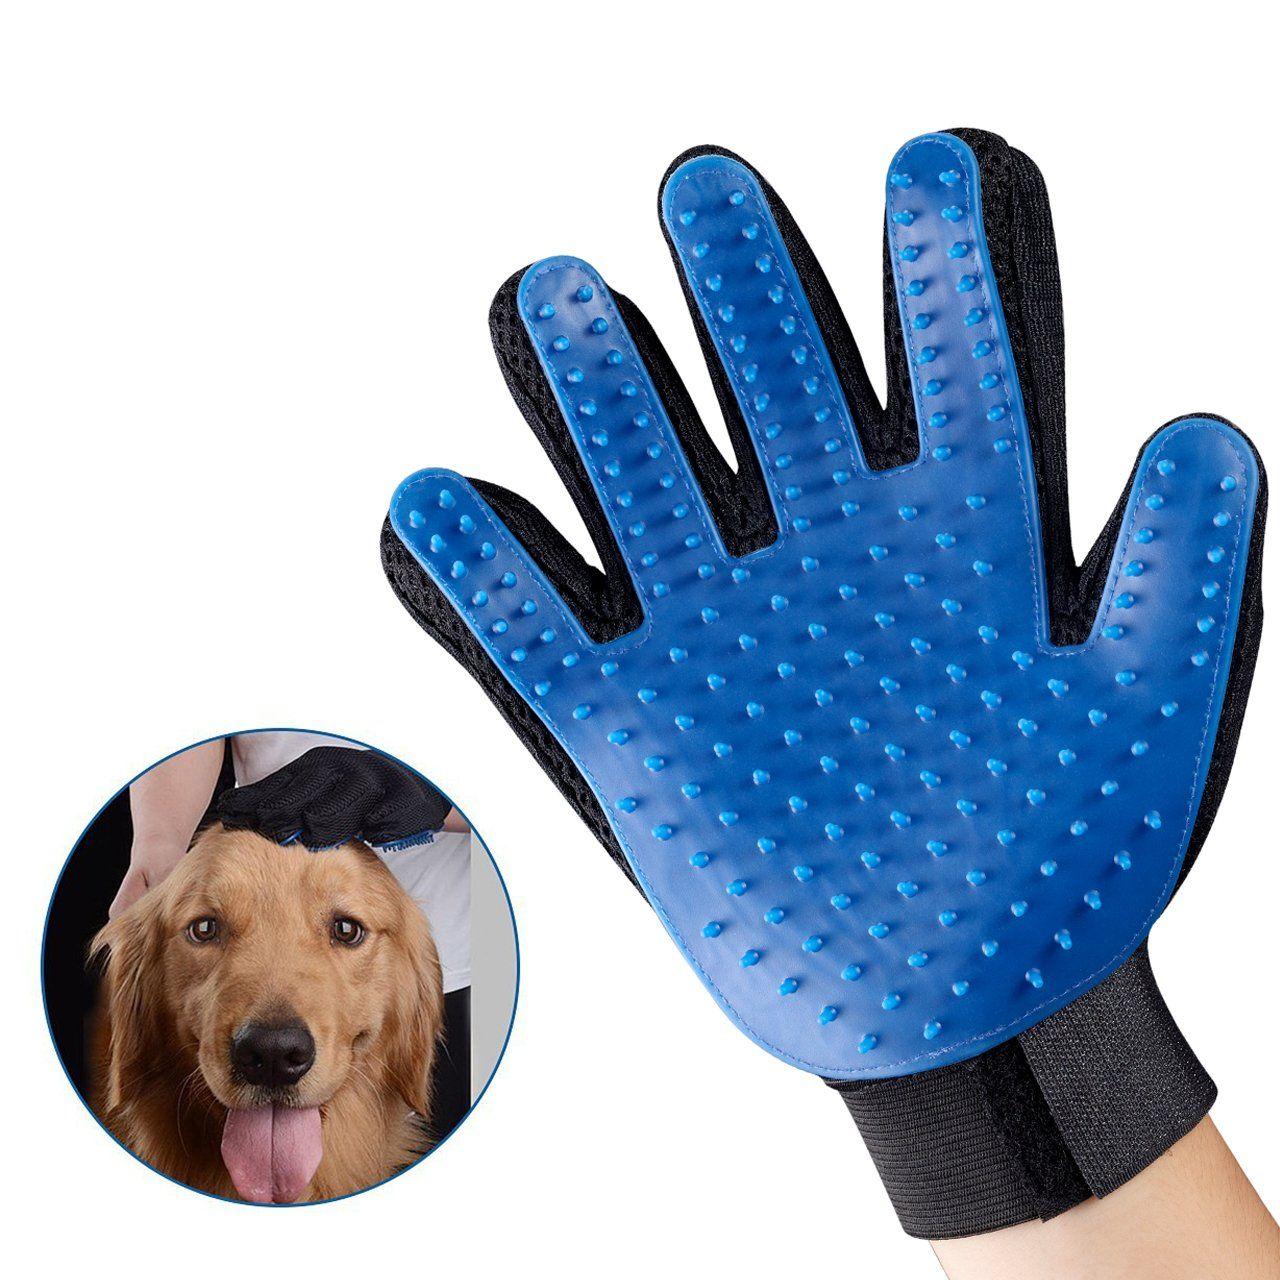 Pet Grooming Glove Gentle Deshedding Brush Glove Efficient Pet Hair Remover Mitt Massage Tool With Enhanced Five Finger Design Per Dog Cat Pet Grooming Pets